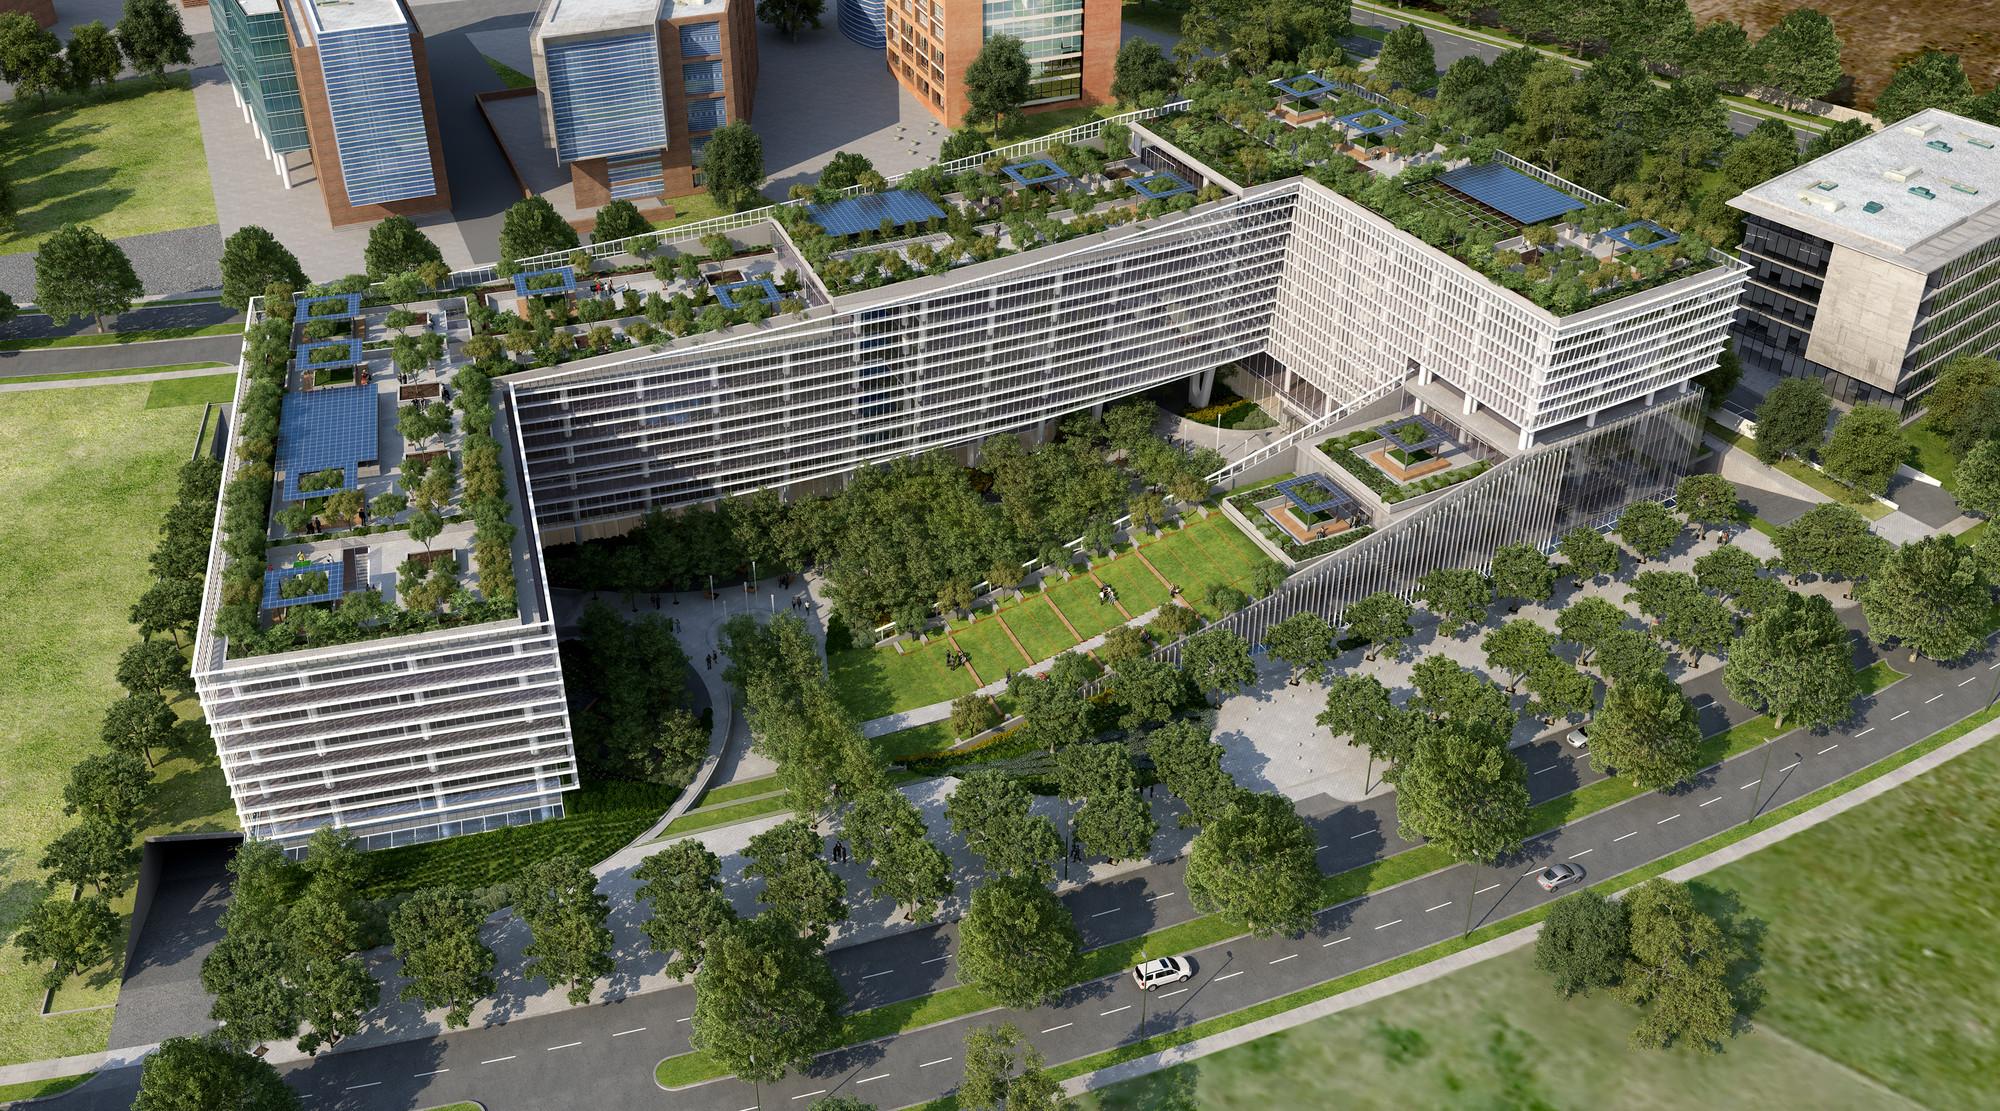 World Green Center Cce Arquitectos Andreu Arquitectos